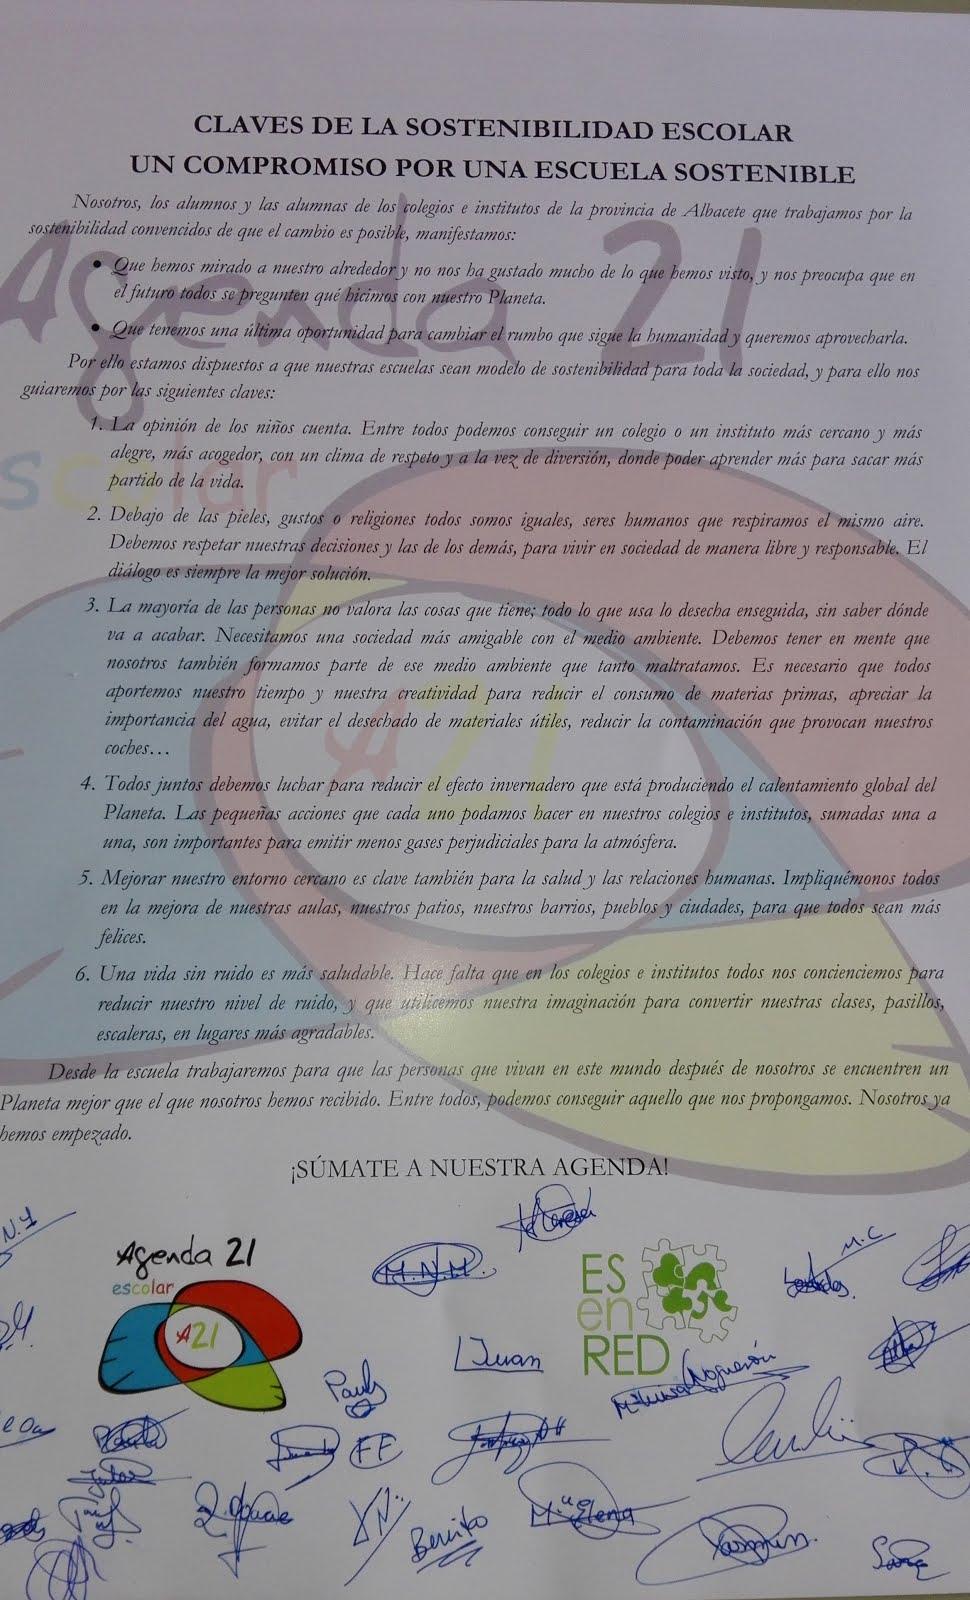 Manifiesto Agenda 21.